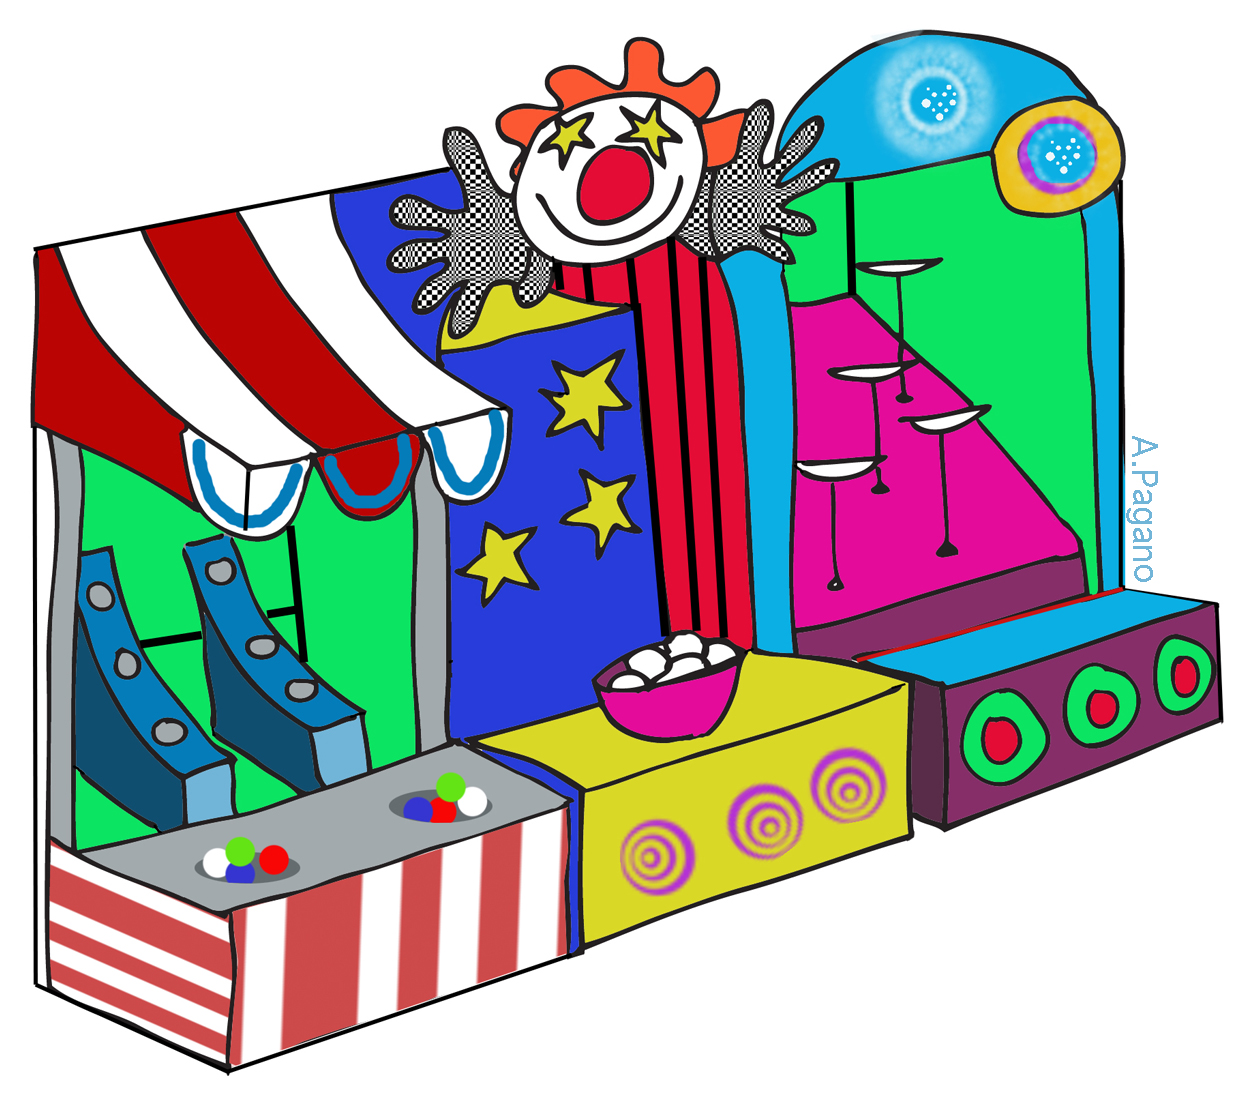 game clipart carnival game. carnival_game_07 clipart . carnival_game_07 clipart . newsimg